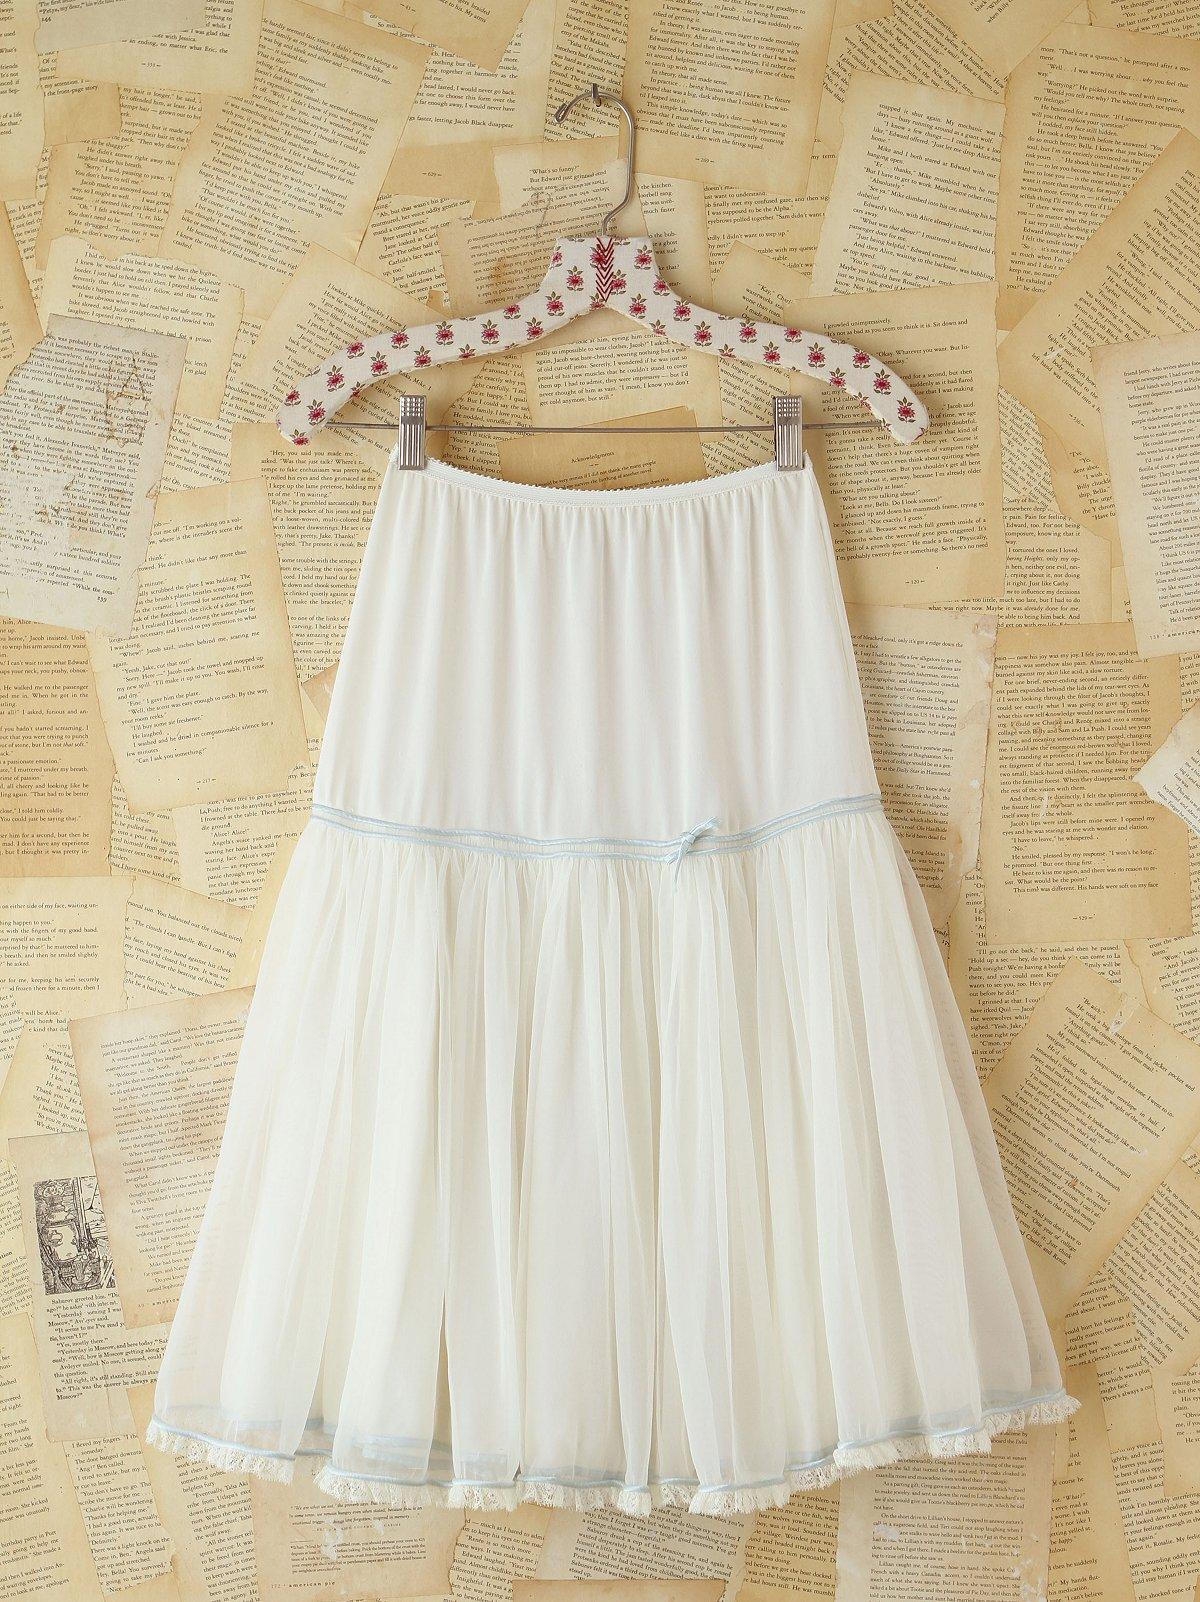 Vintage White Layered Skirt